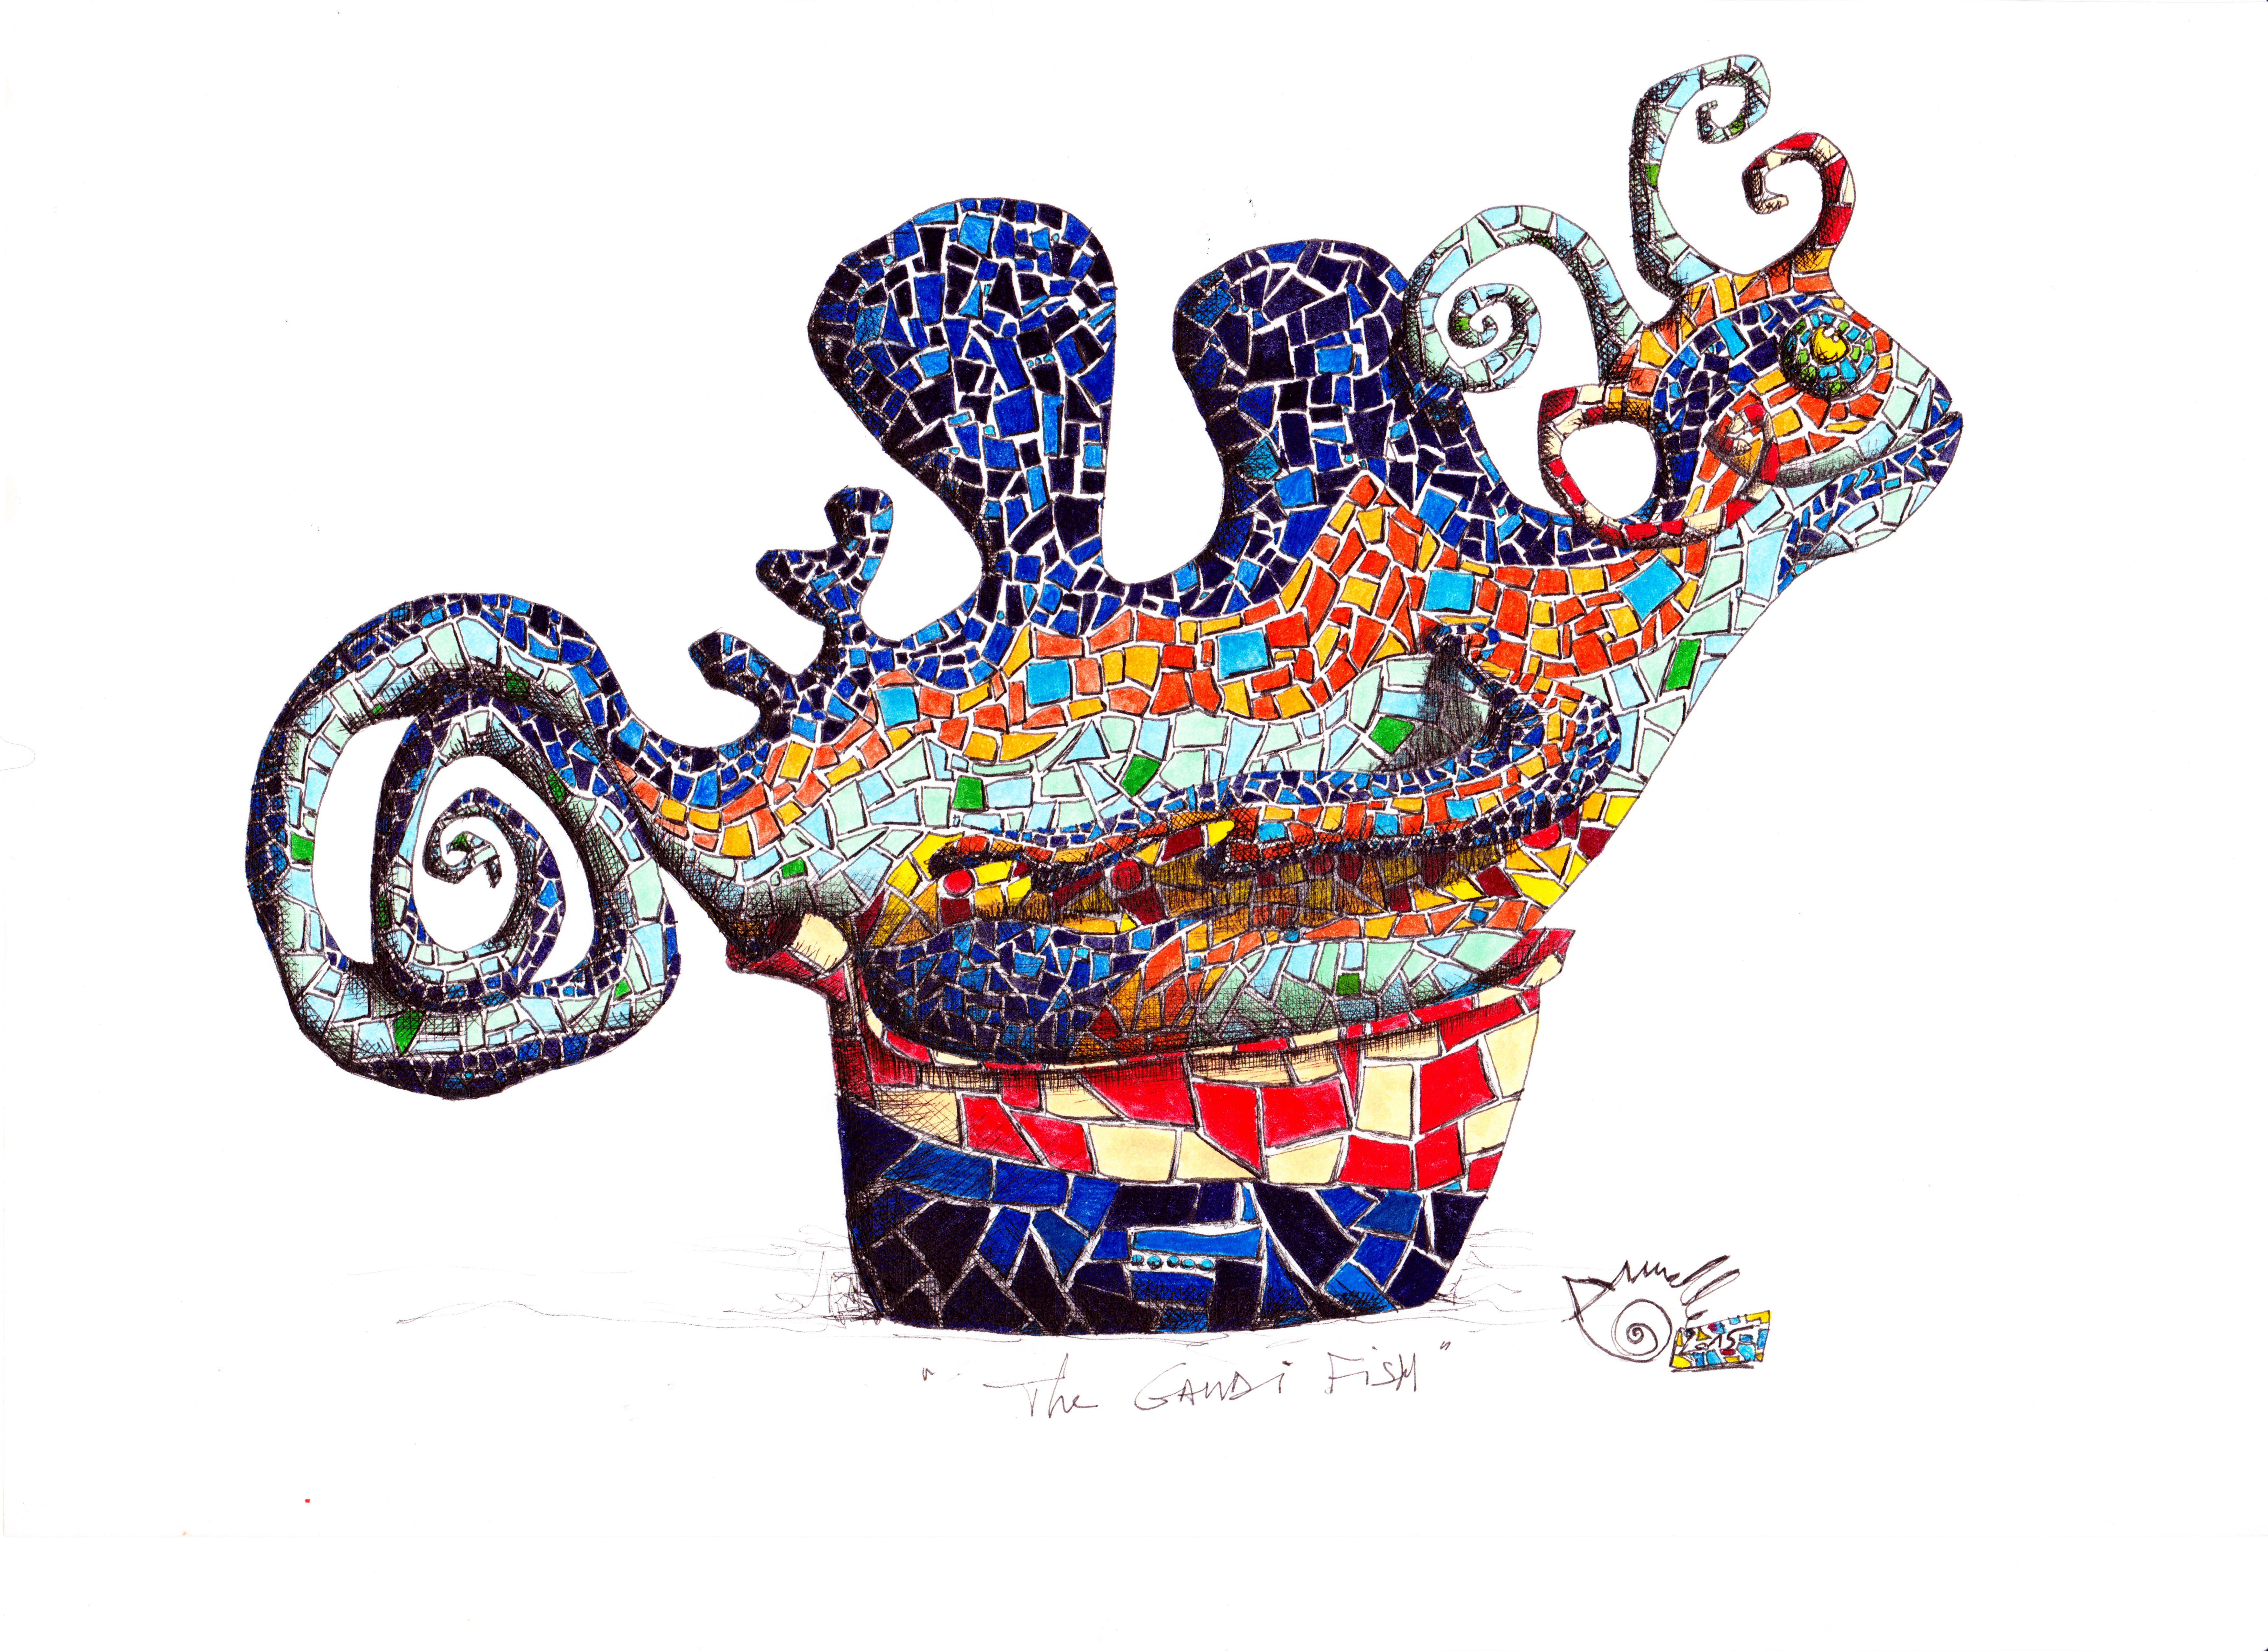 the gaudi fish